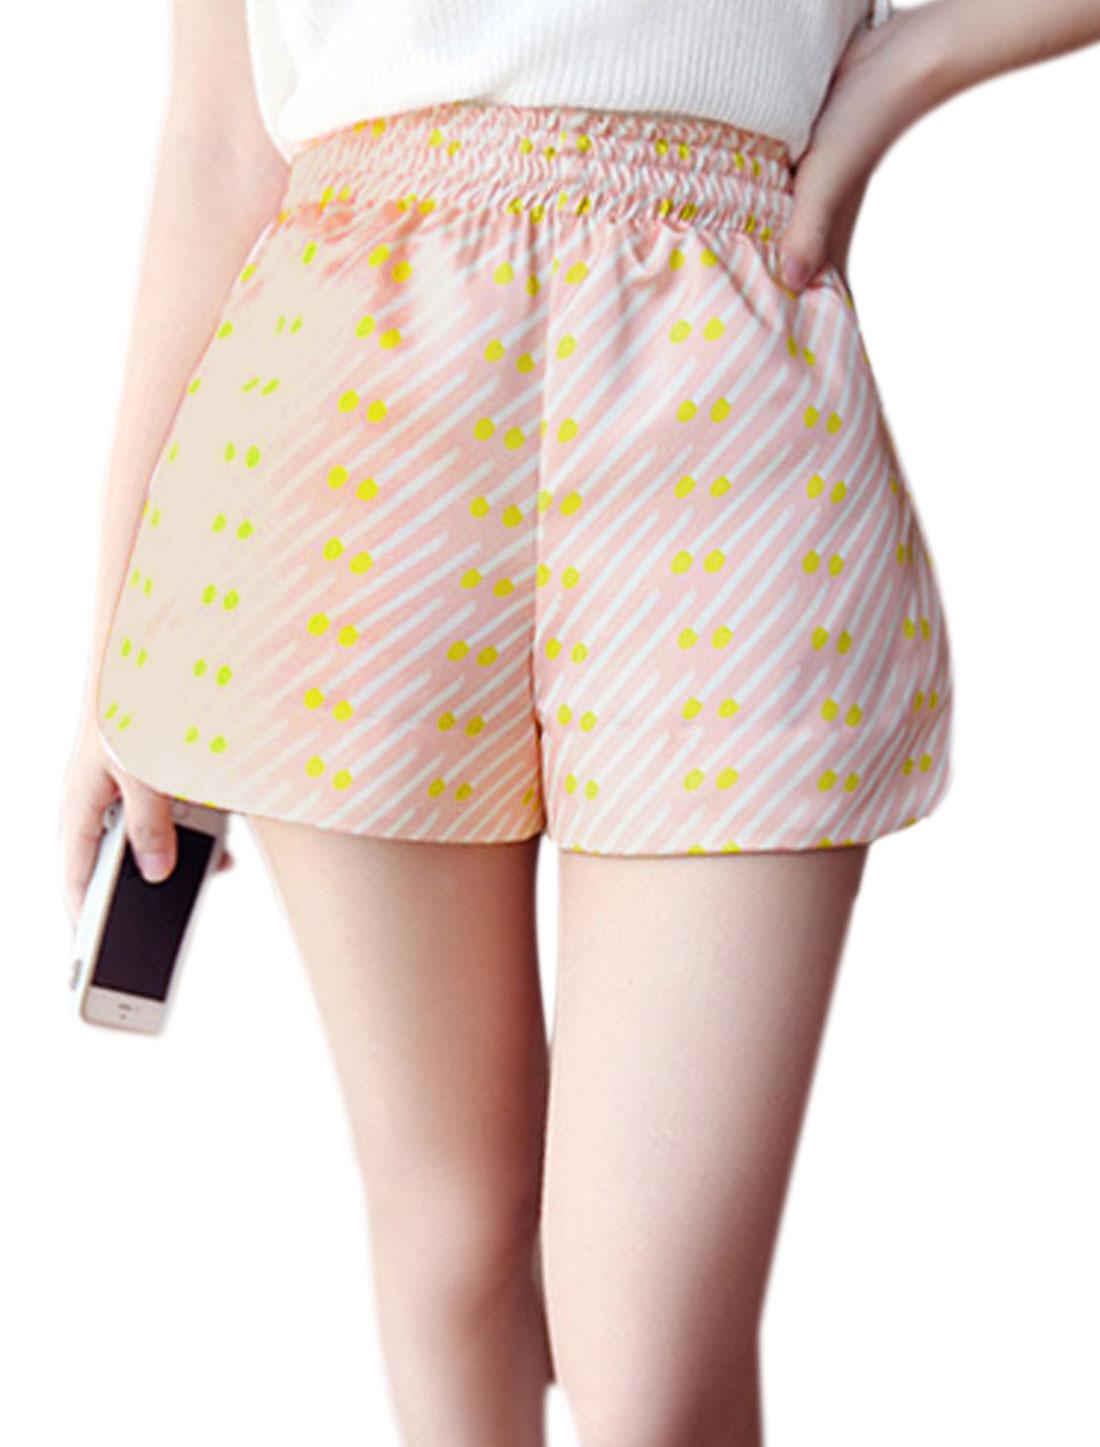 Lady Elastic Waist Matchstick Prints Summer Shorts Pink XS